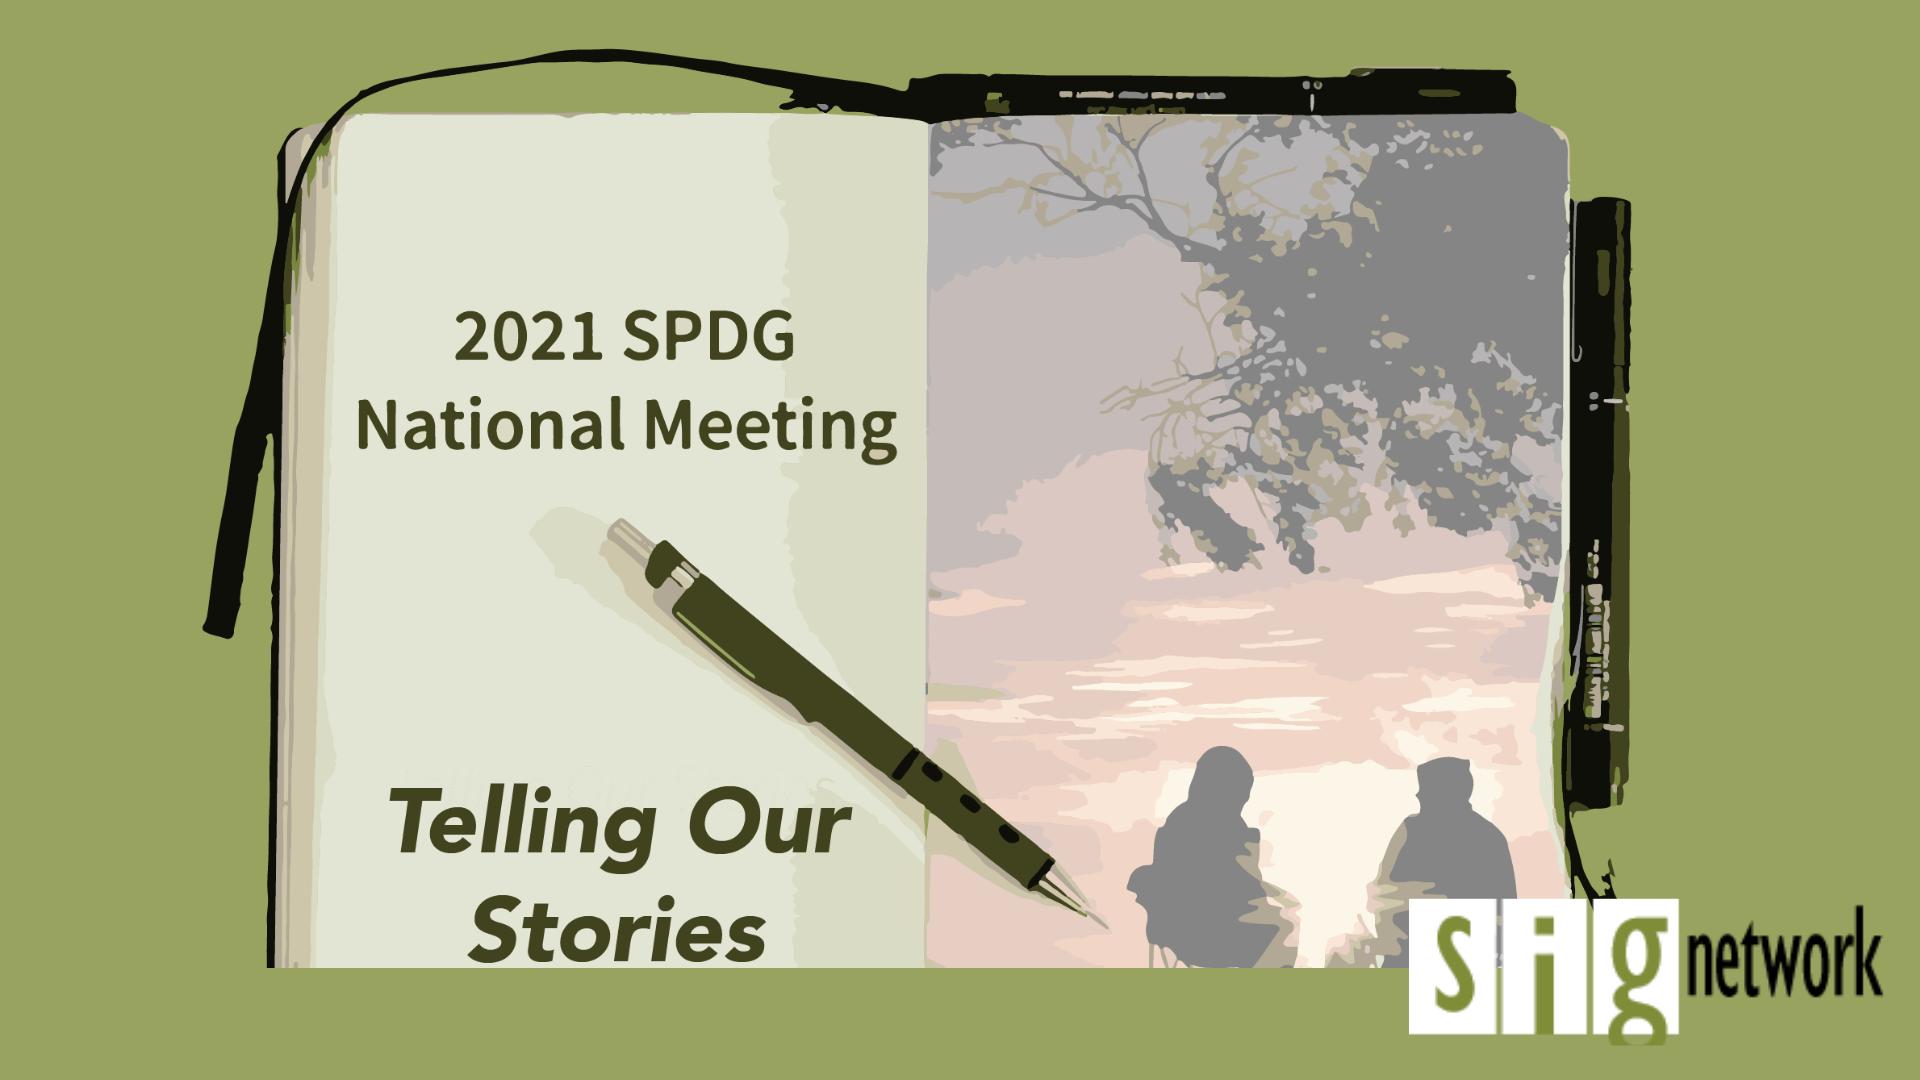 2021 SPDG National Meeting